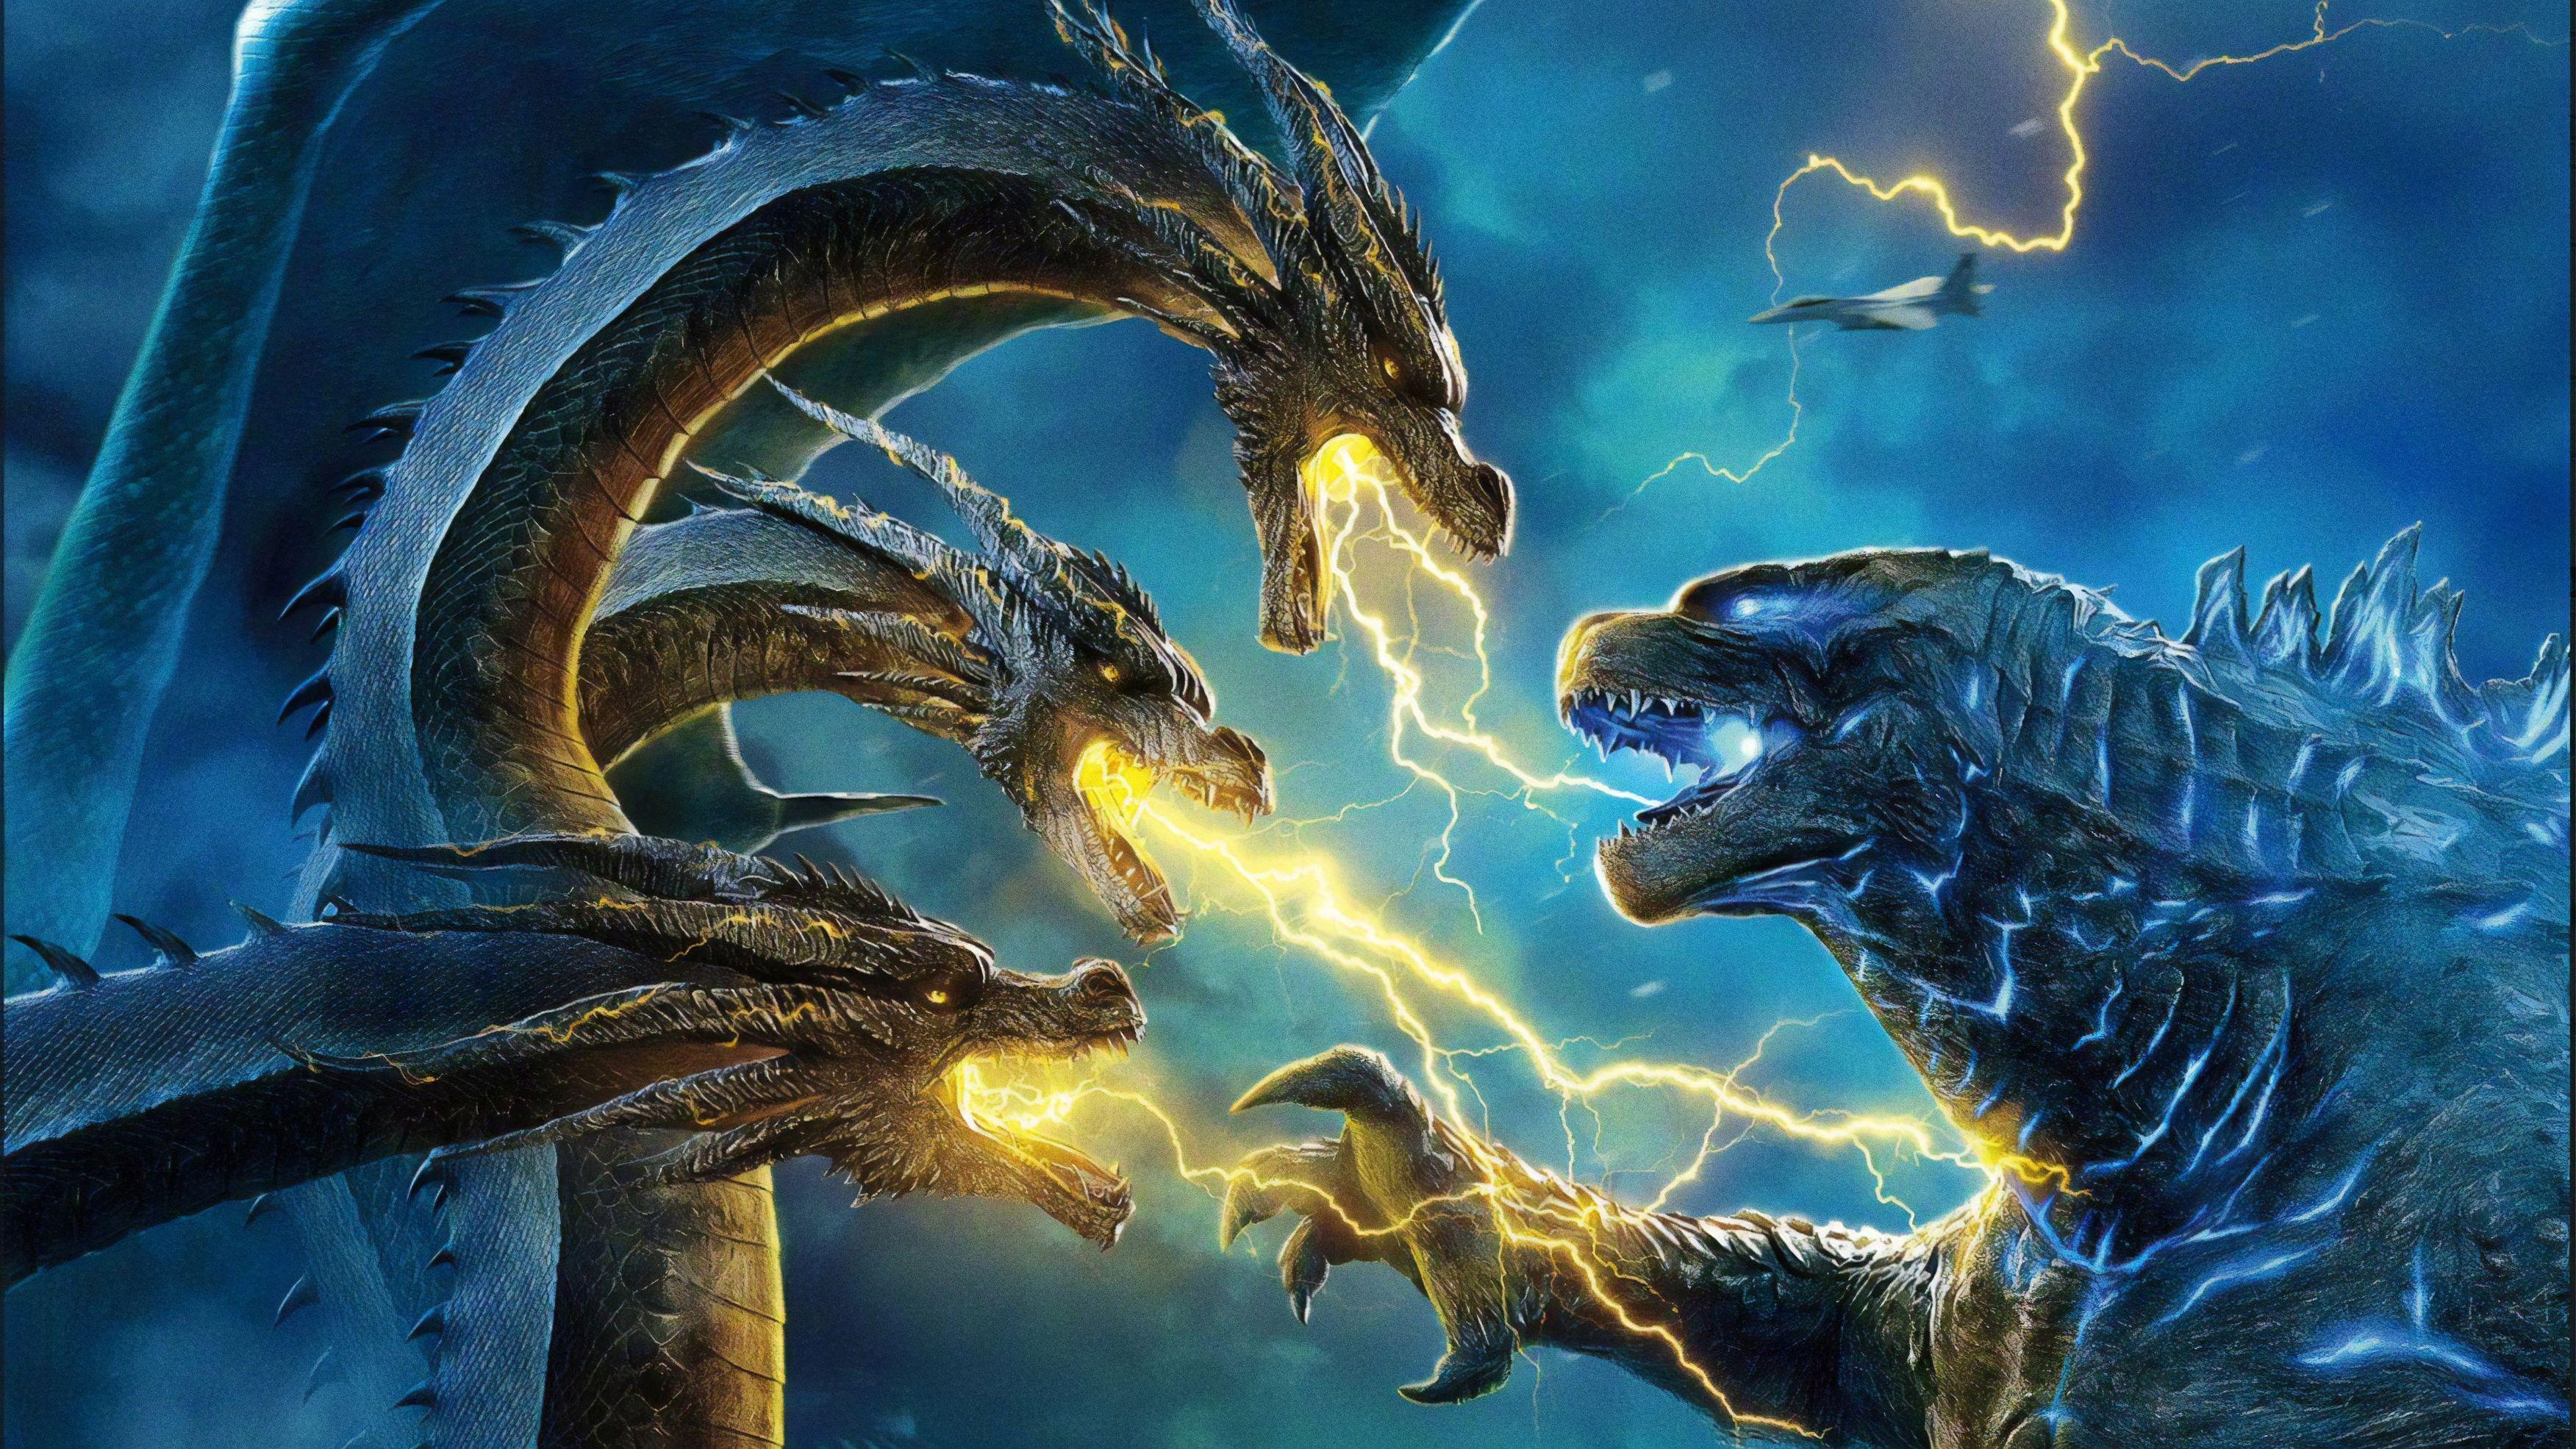 Godzilla King Of The Monsters Wallpapers Top Free Godzilla